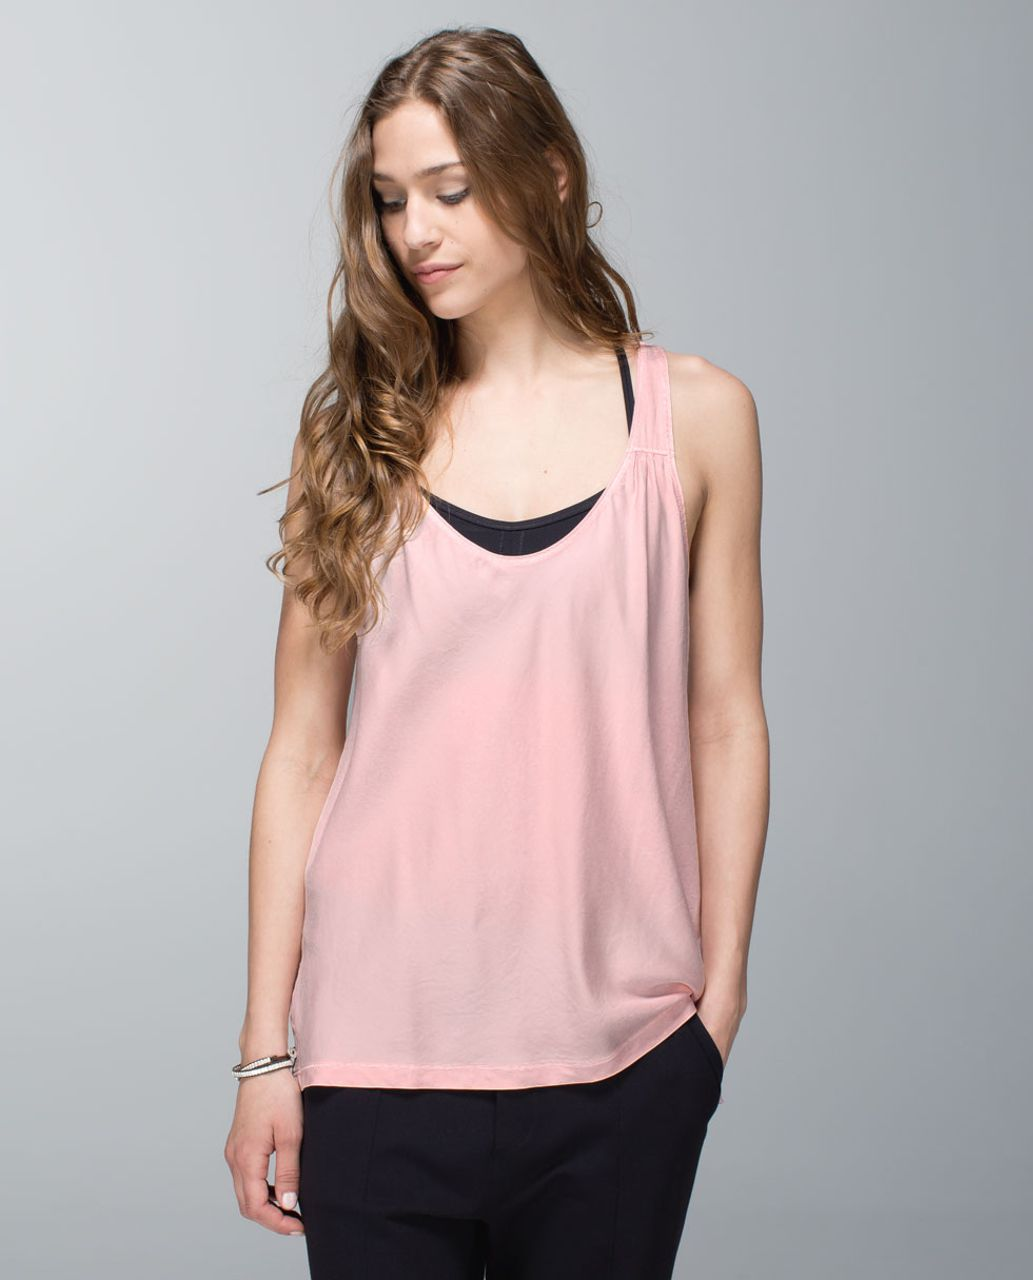 318dcc686483ef Lululemon Peace Of Mind Tank - Pretty Pink - lulu fanatics